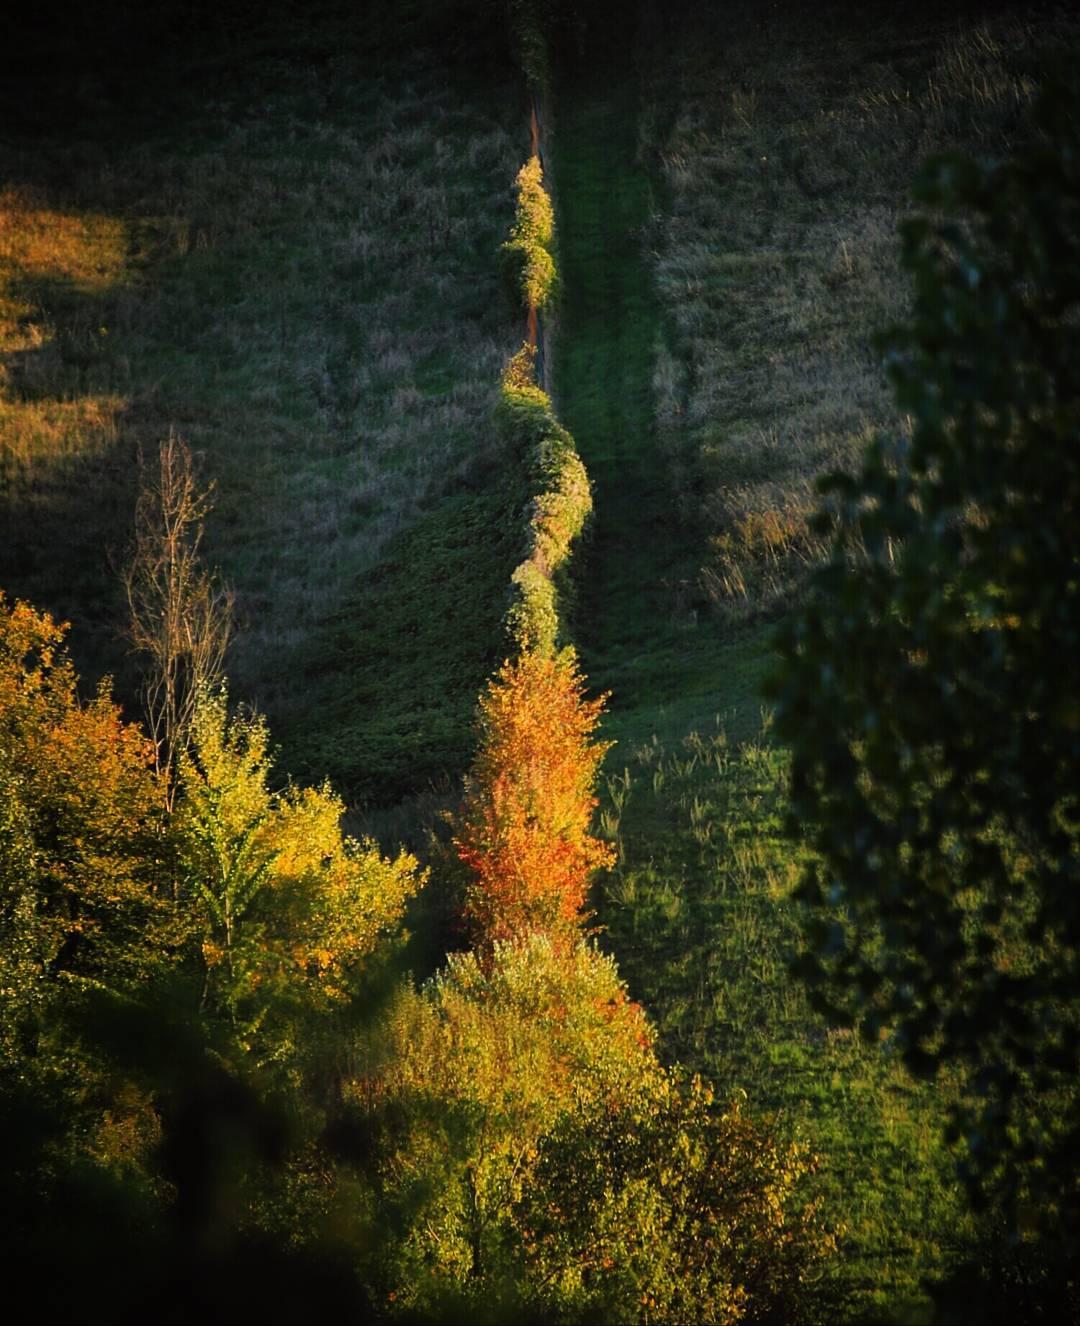 Fall Foliage #InEmiliaRomagna colli bolognesi ph. ilaria.dicocco